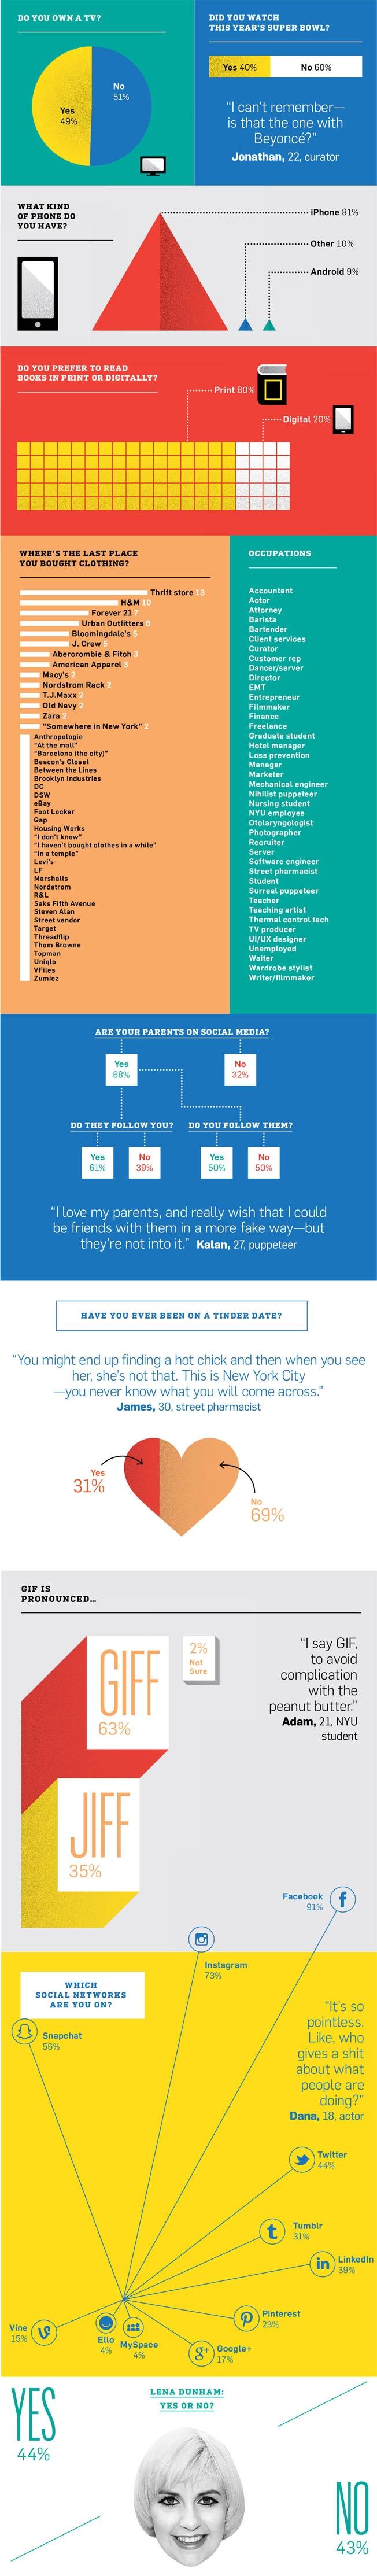 fea-millennial-infographic-01-2014